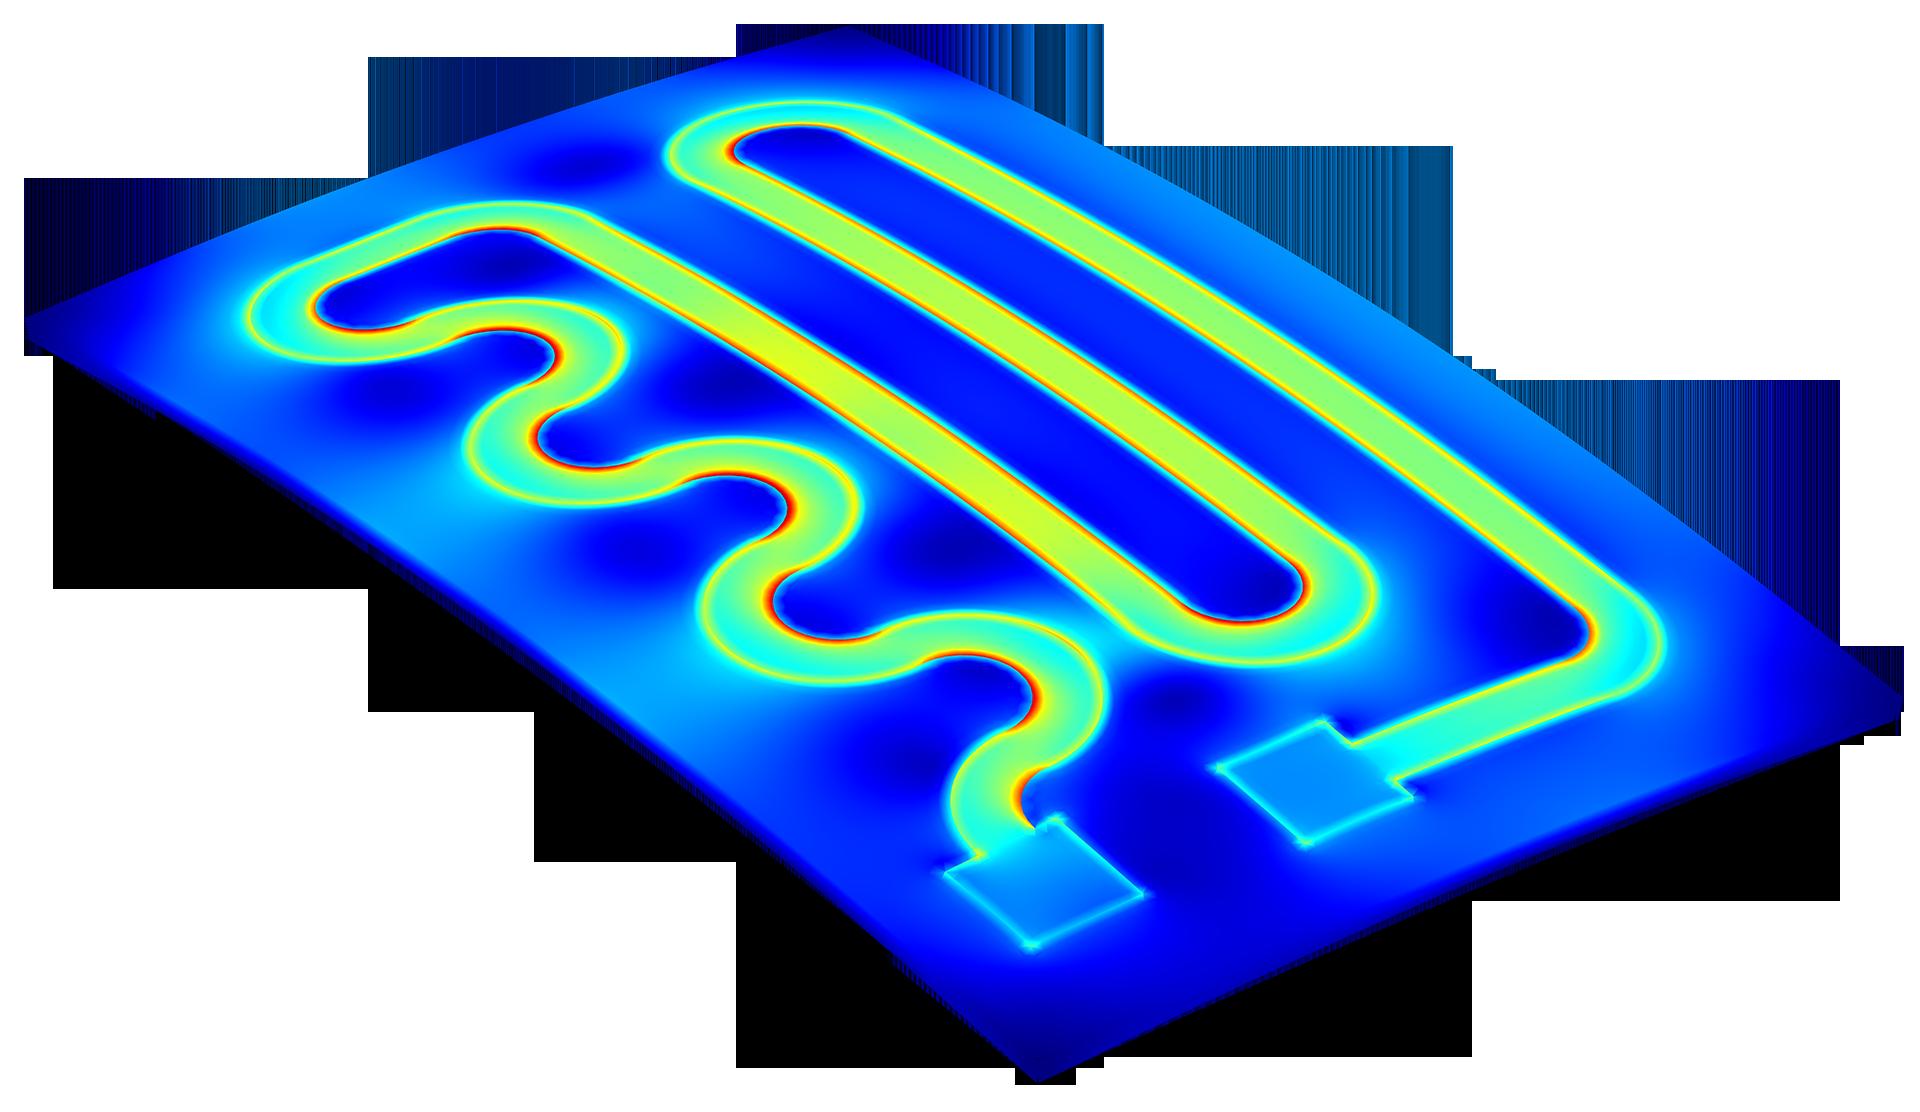 Heat clipart heat energy. The joule heating effect